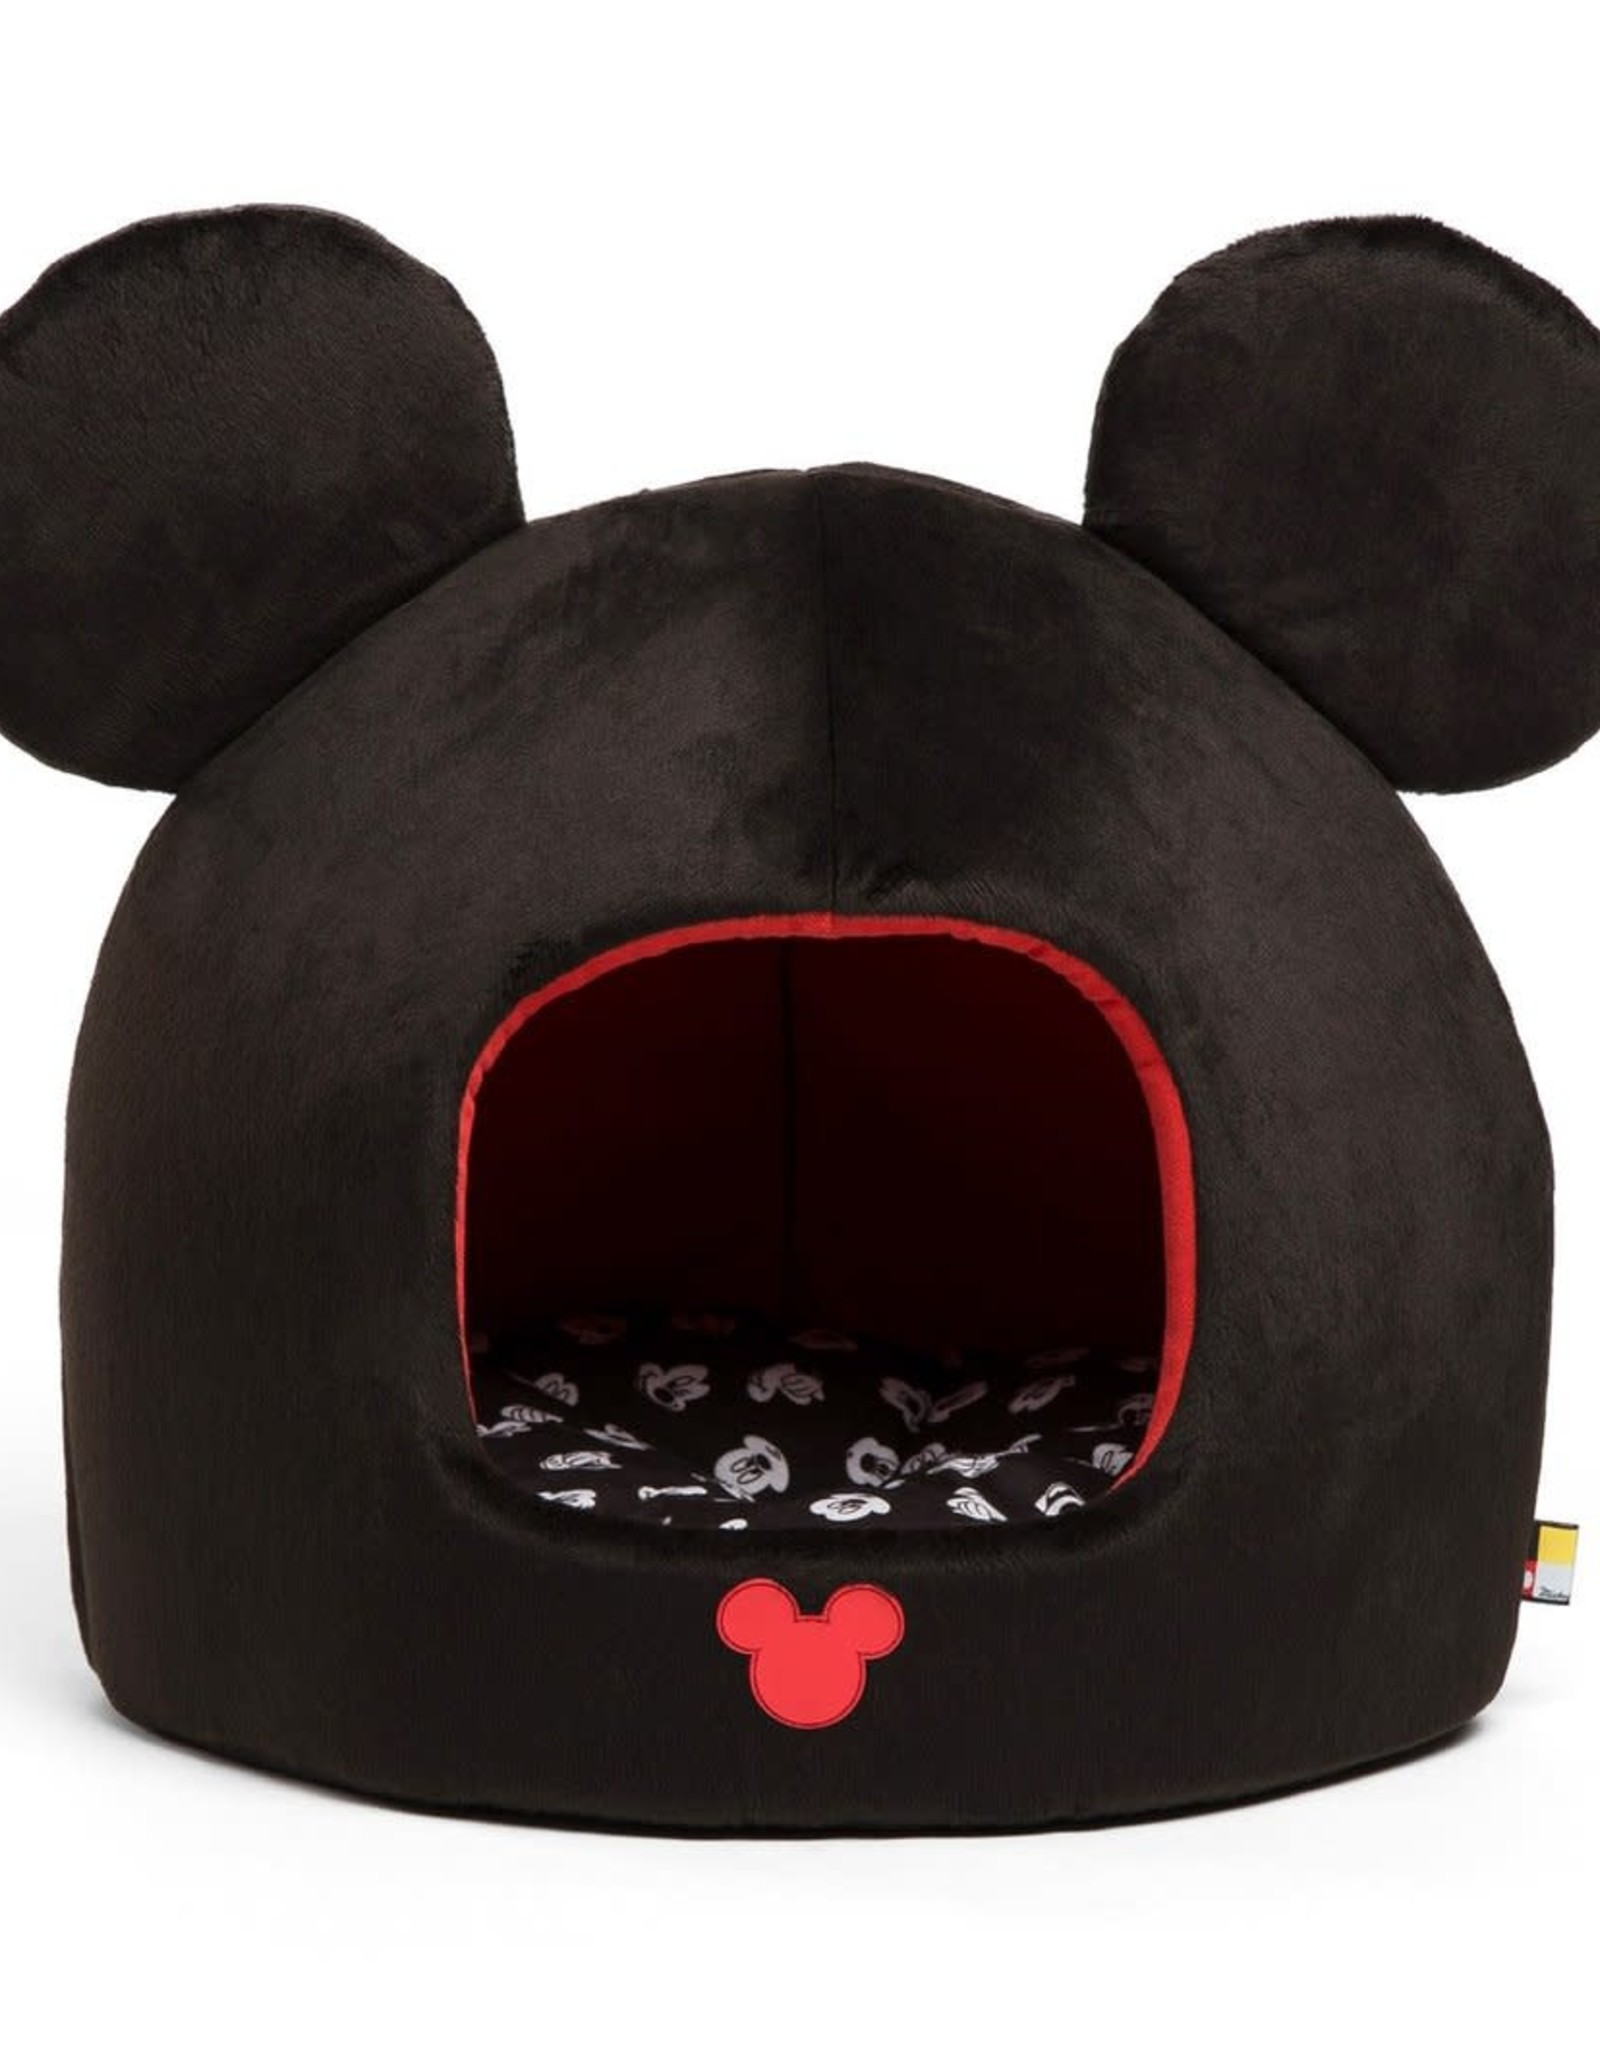 Sentiments Disney Mickey Dome